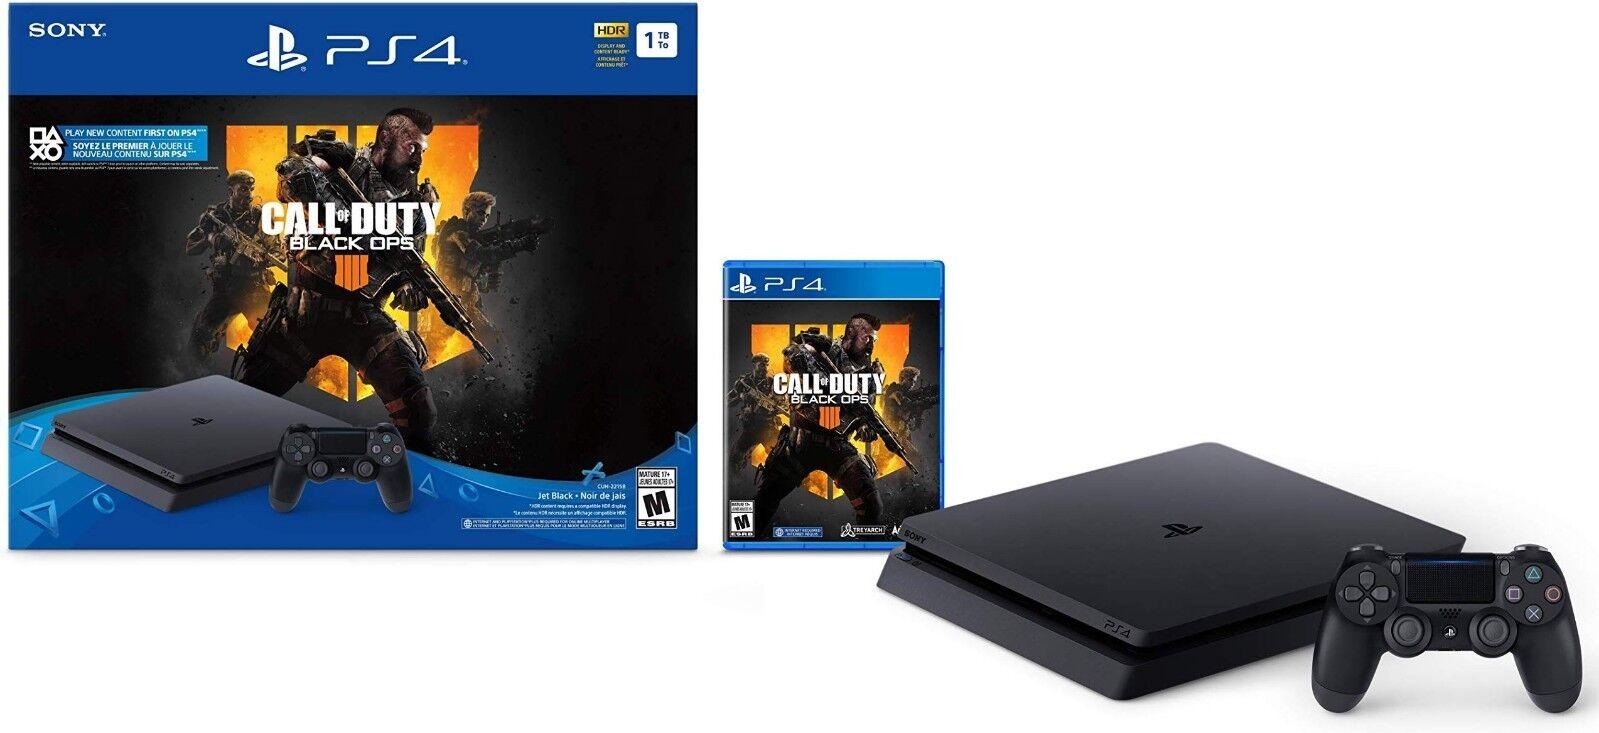 PlayStation 4 Slim 1TB Call of Duty: Black Ops 4 Console Bun